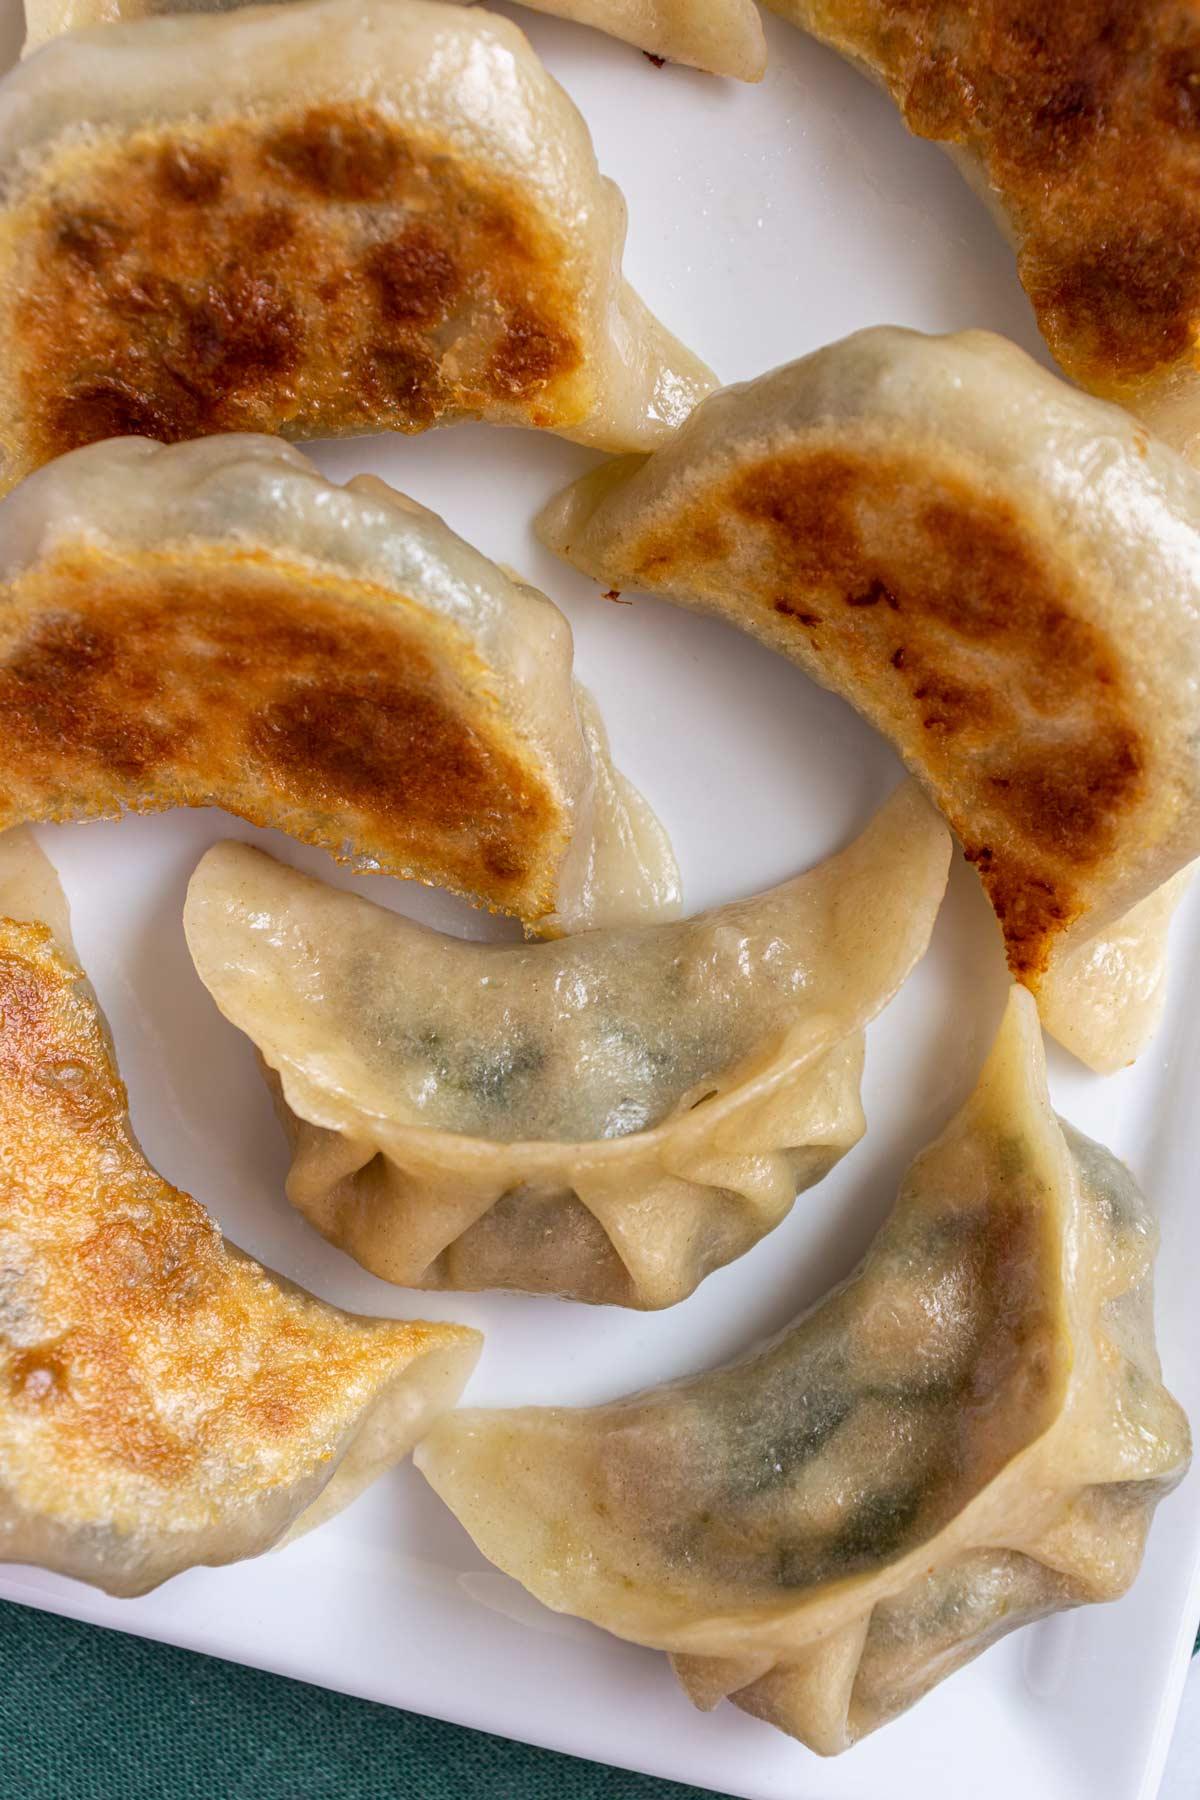 Closeup of pan-fried vegetable dumplings on a white plate.